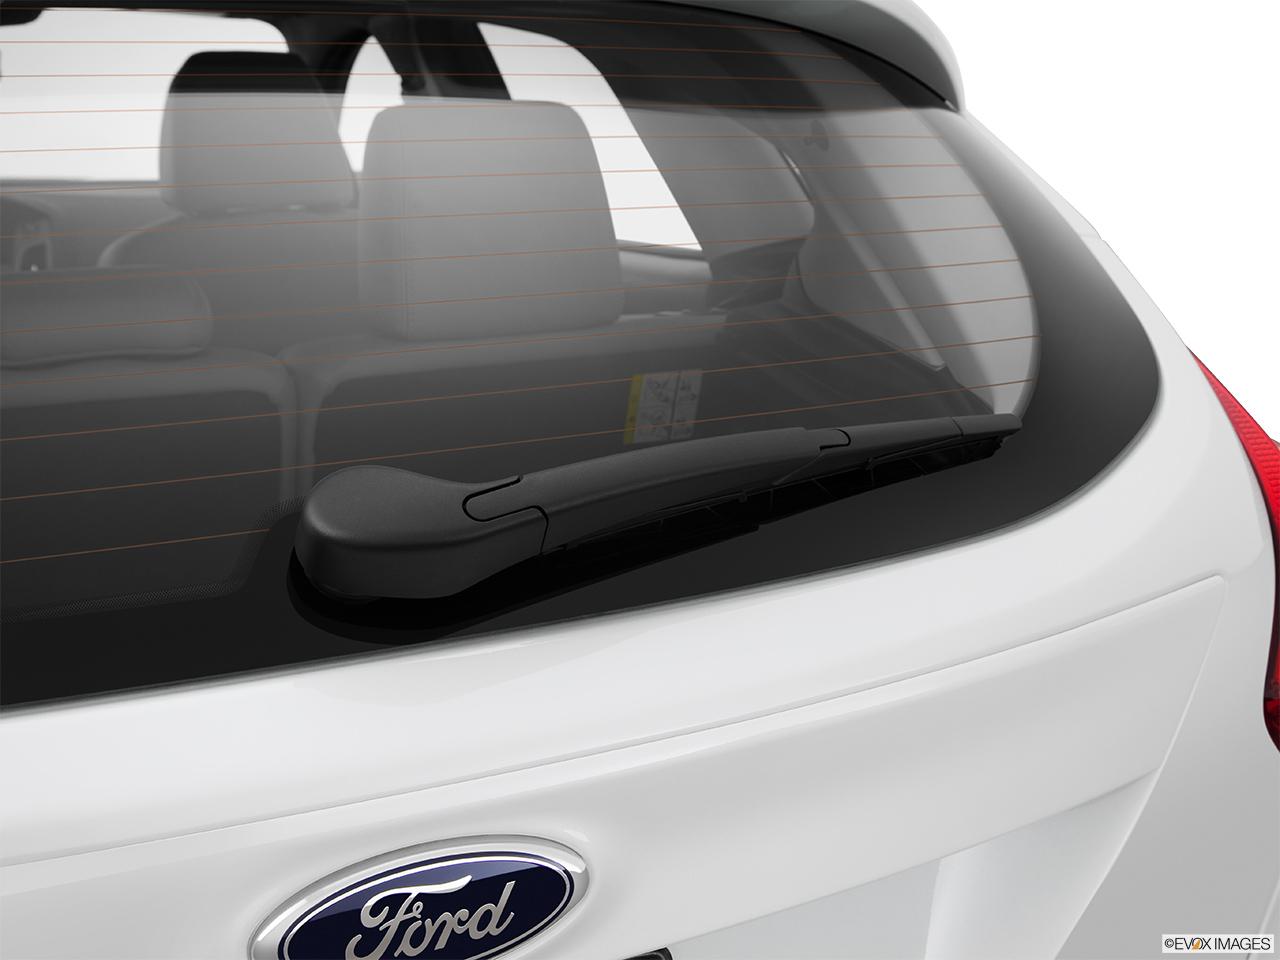 2015 Ford Focus Electric 5dr Hatchback Rear Window Wiper